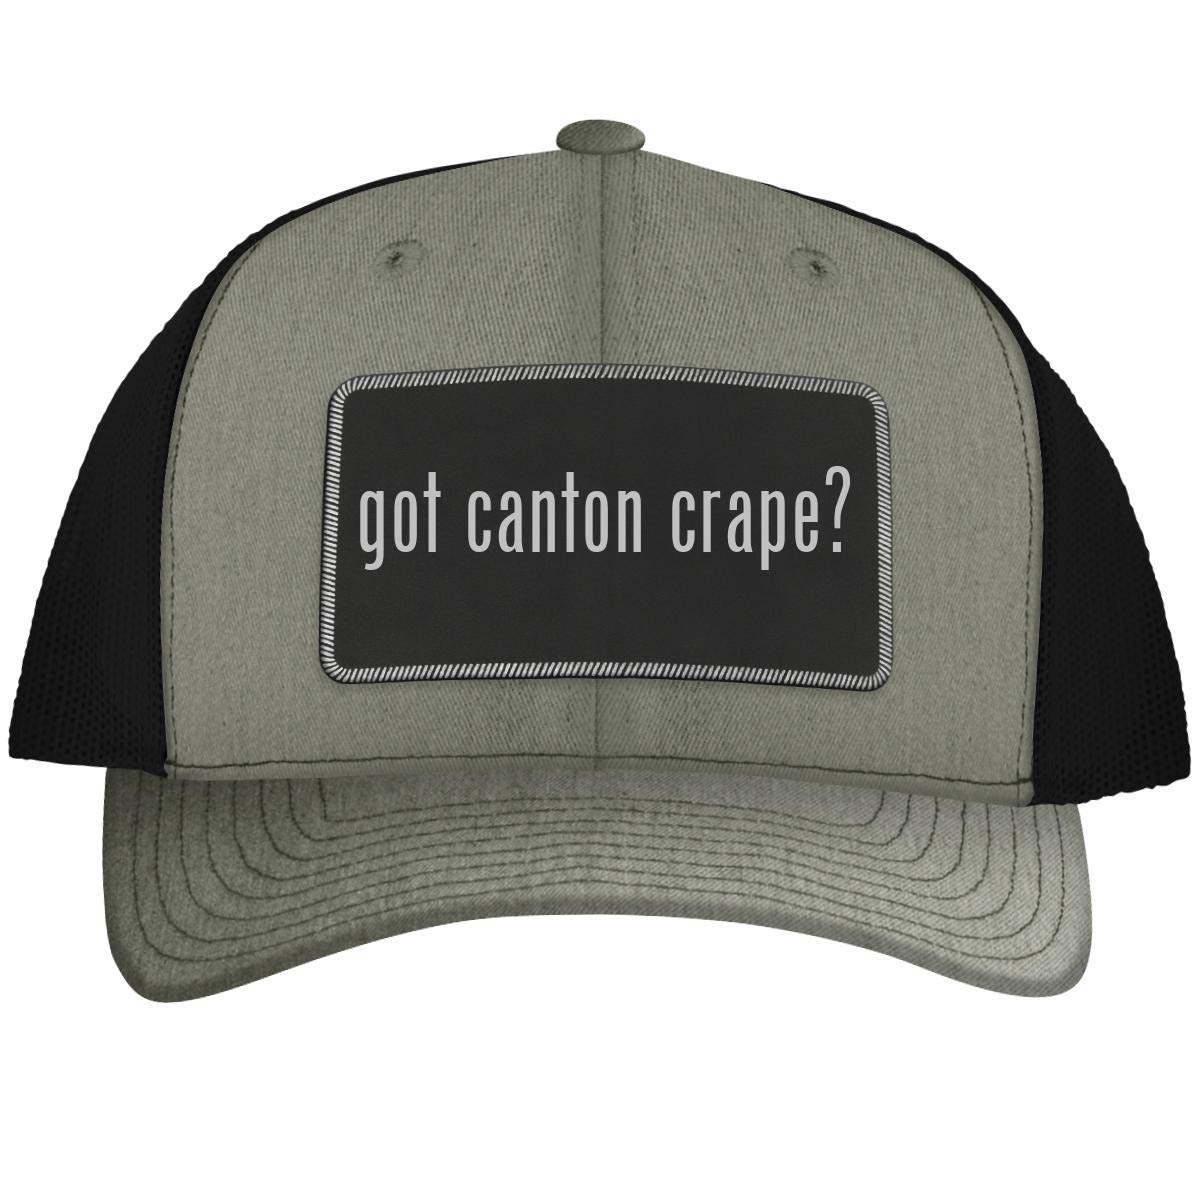 got Canton Crape? - Leather Black Metallic Patch Engraved Trucker Hat, HeatherBlack, One Size by One Legging it Around